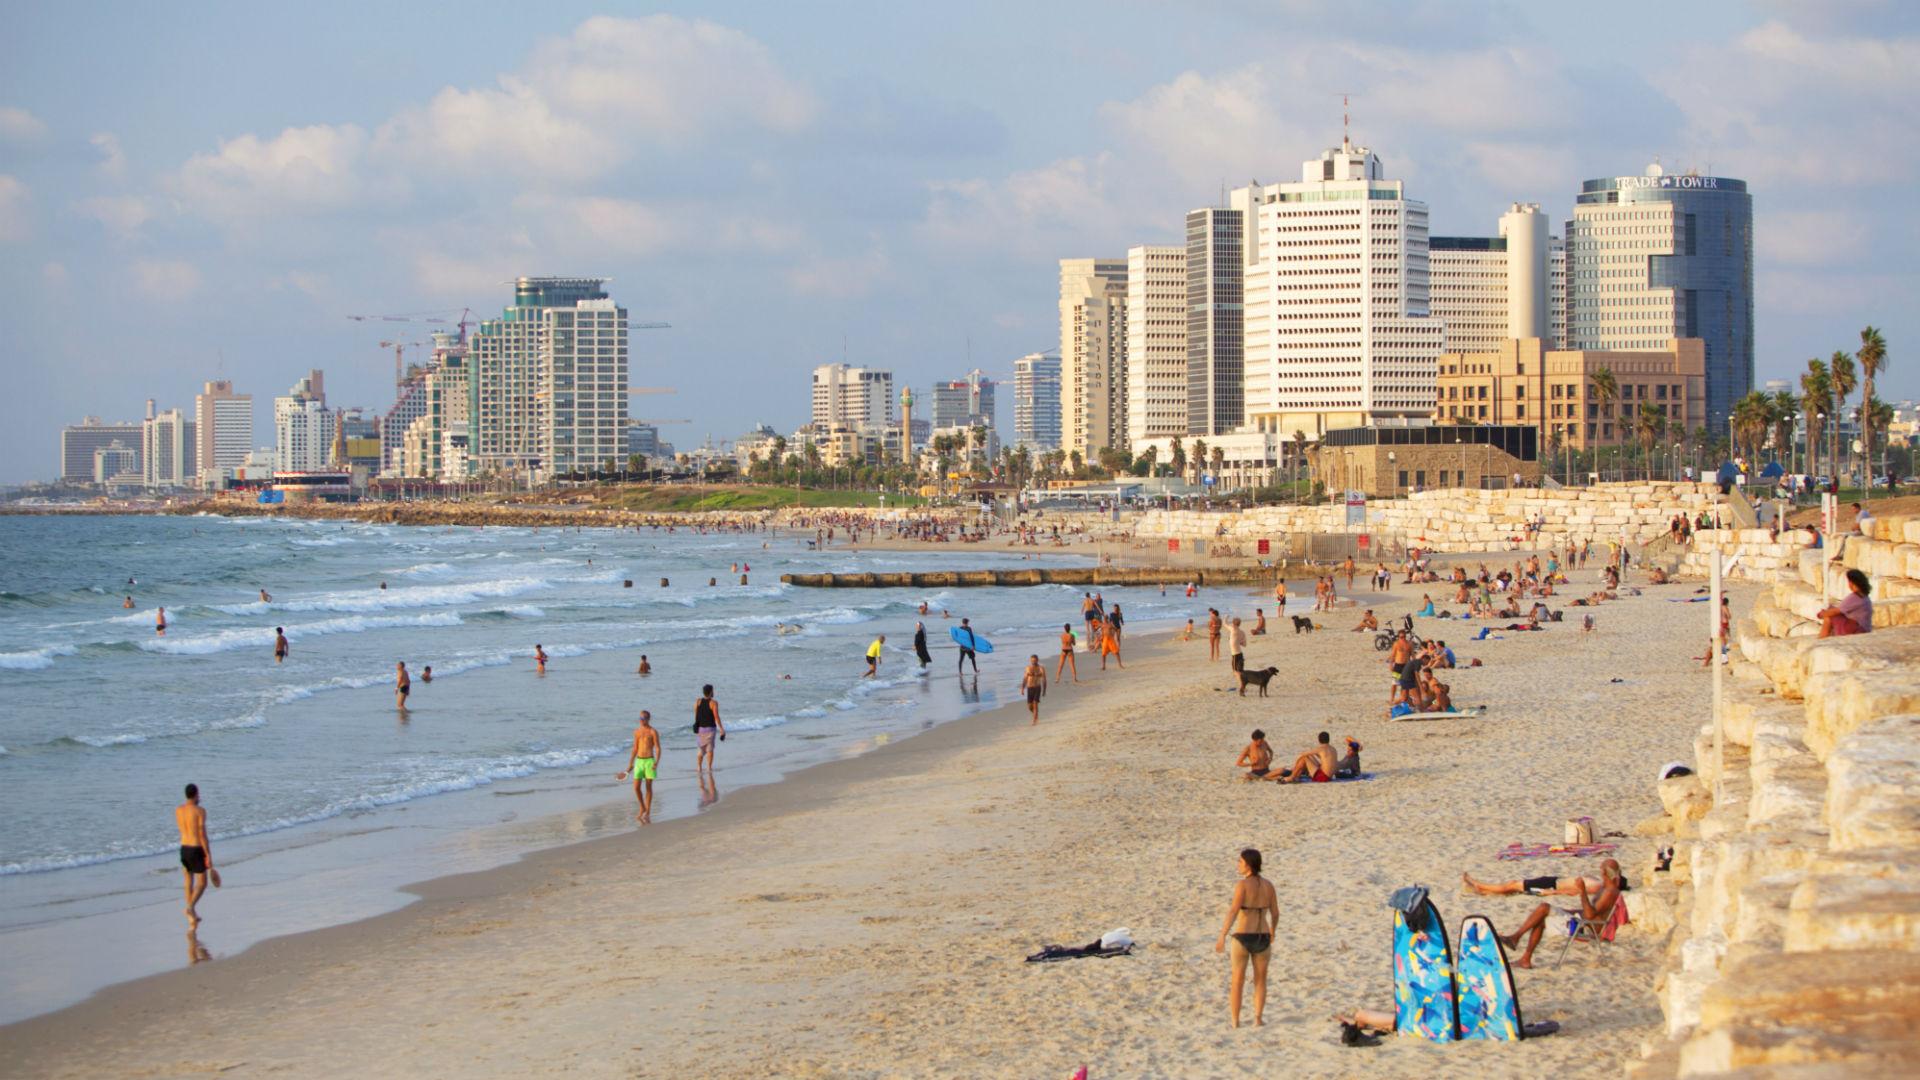 Beach view of Tel Aviv, Israel